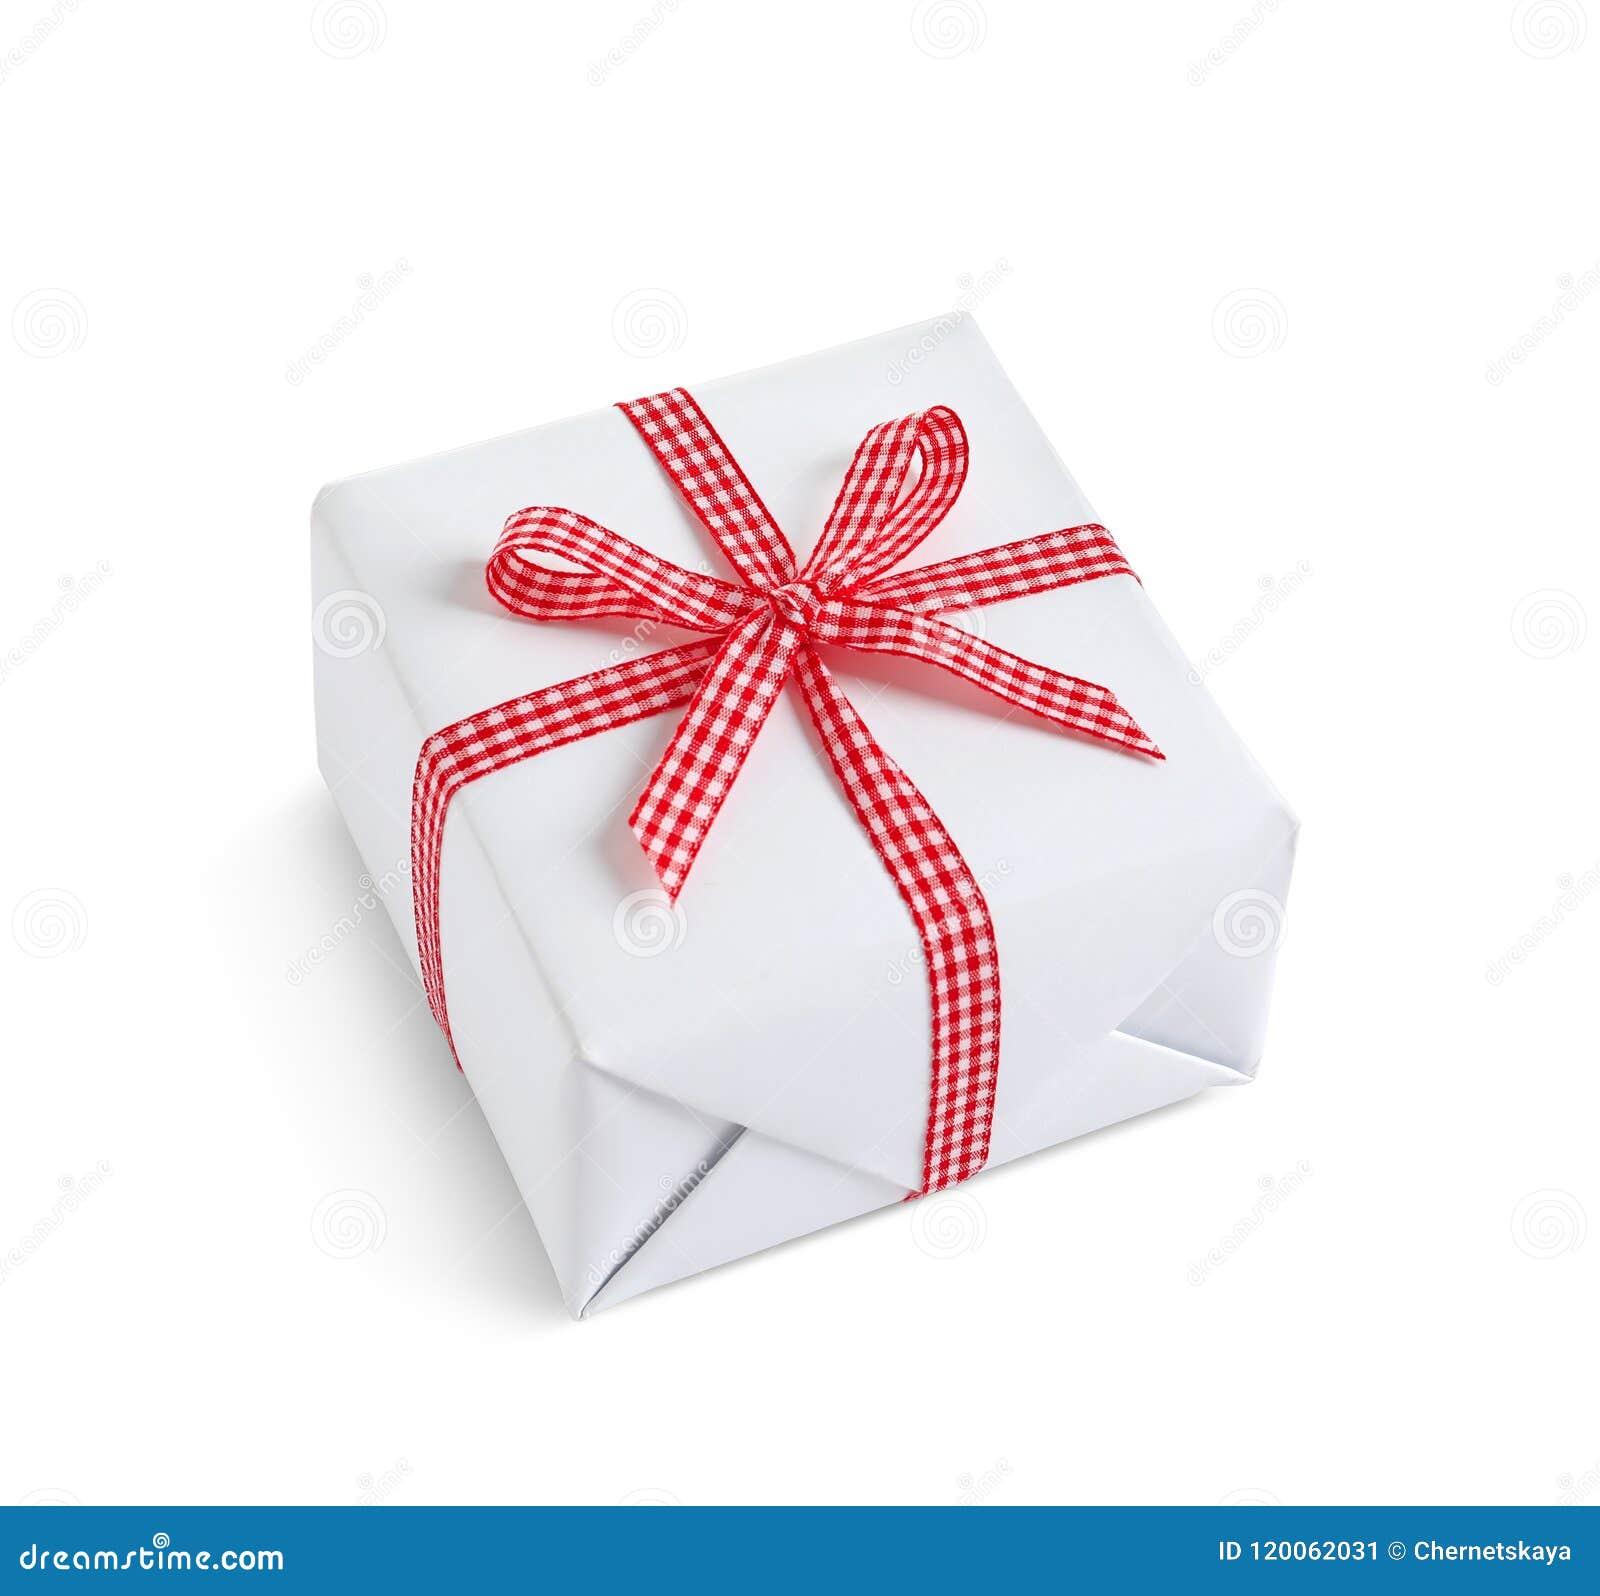 Beautifully wrapped gift box